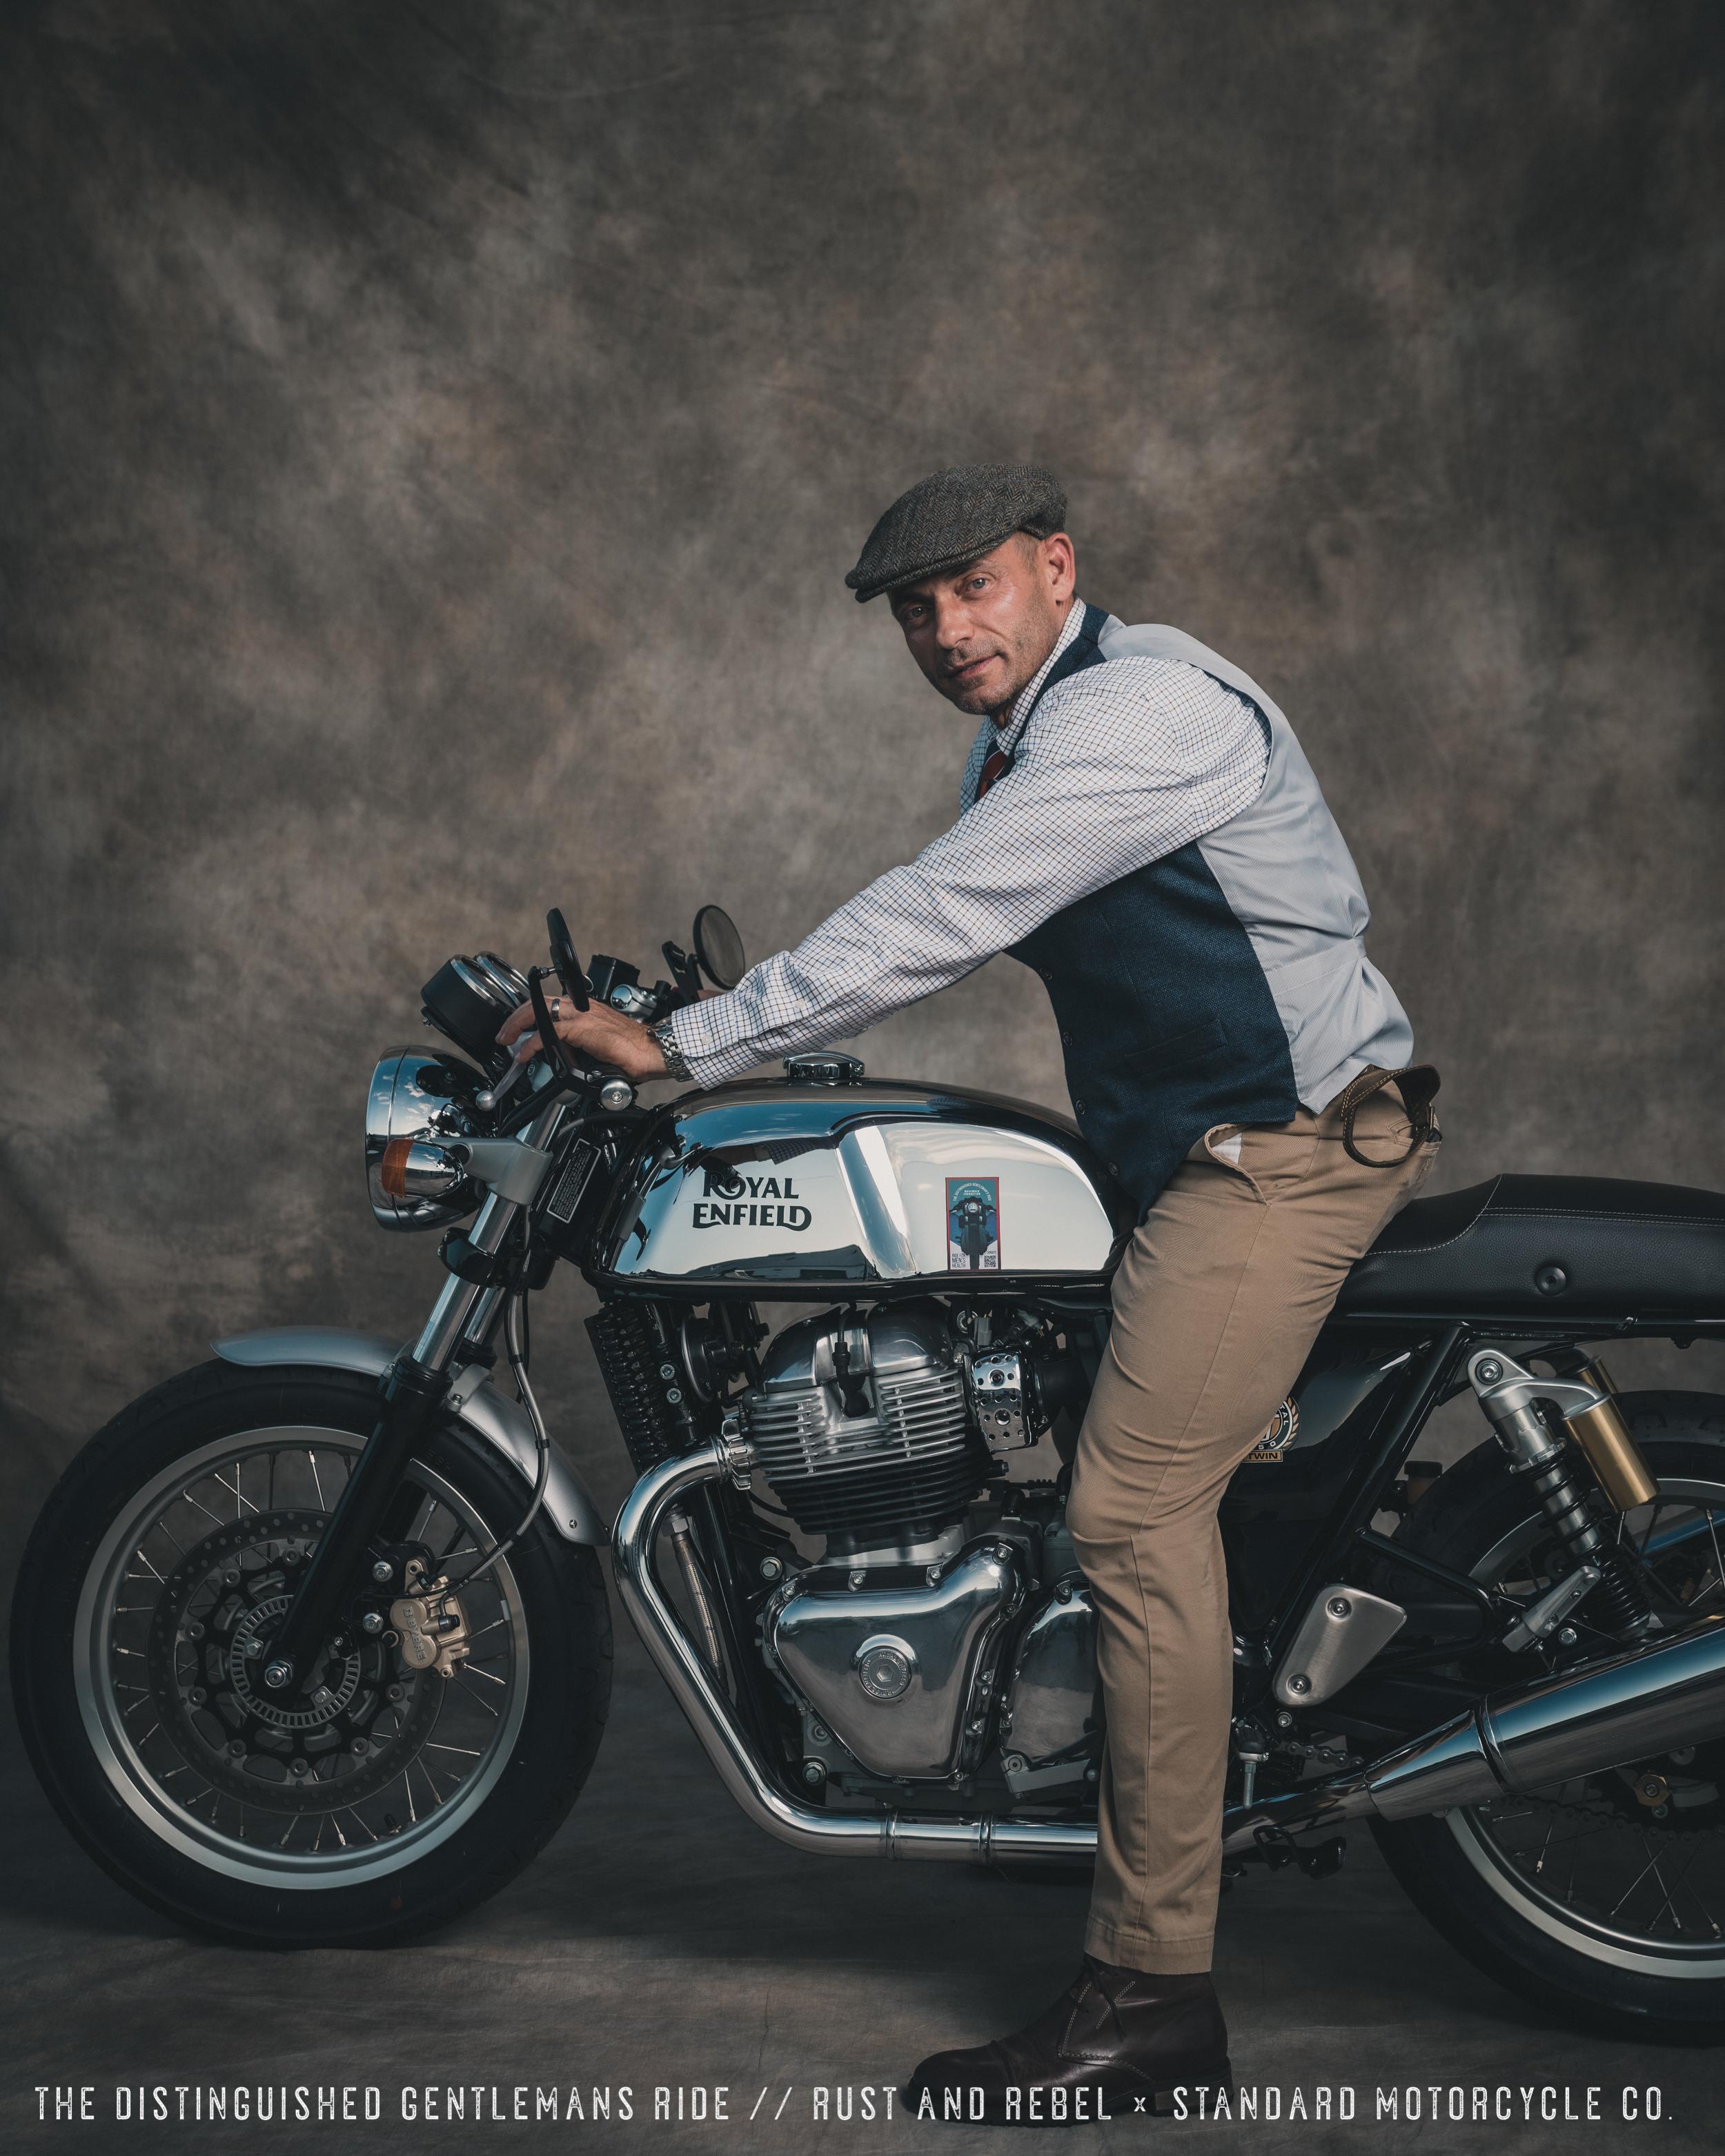 The Distinguished Gentleman's Ride 2019 [PEOPLE - PHOTO BY @MIKEDUNNUSA] - 0110.jpg